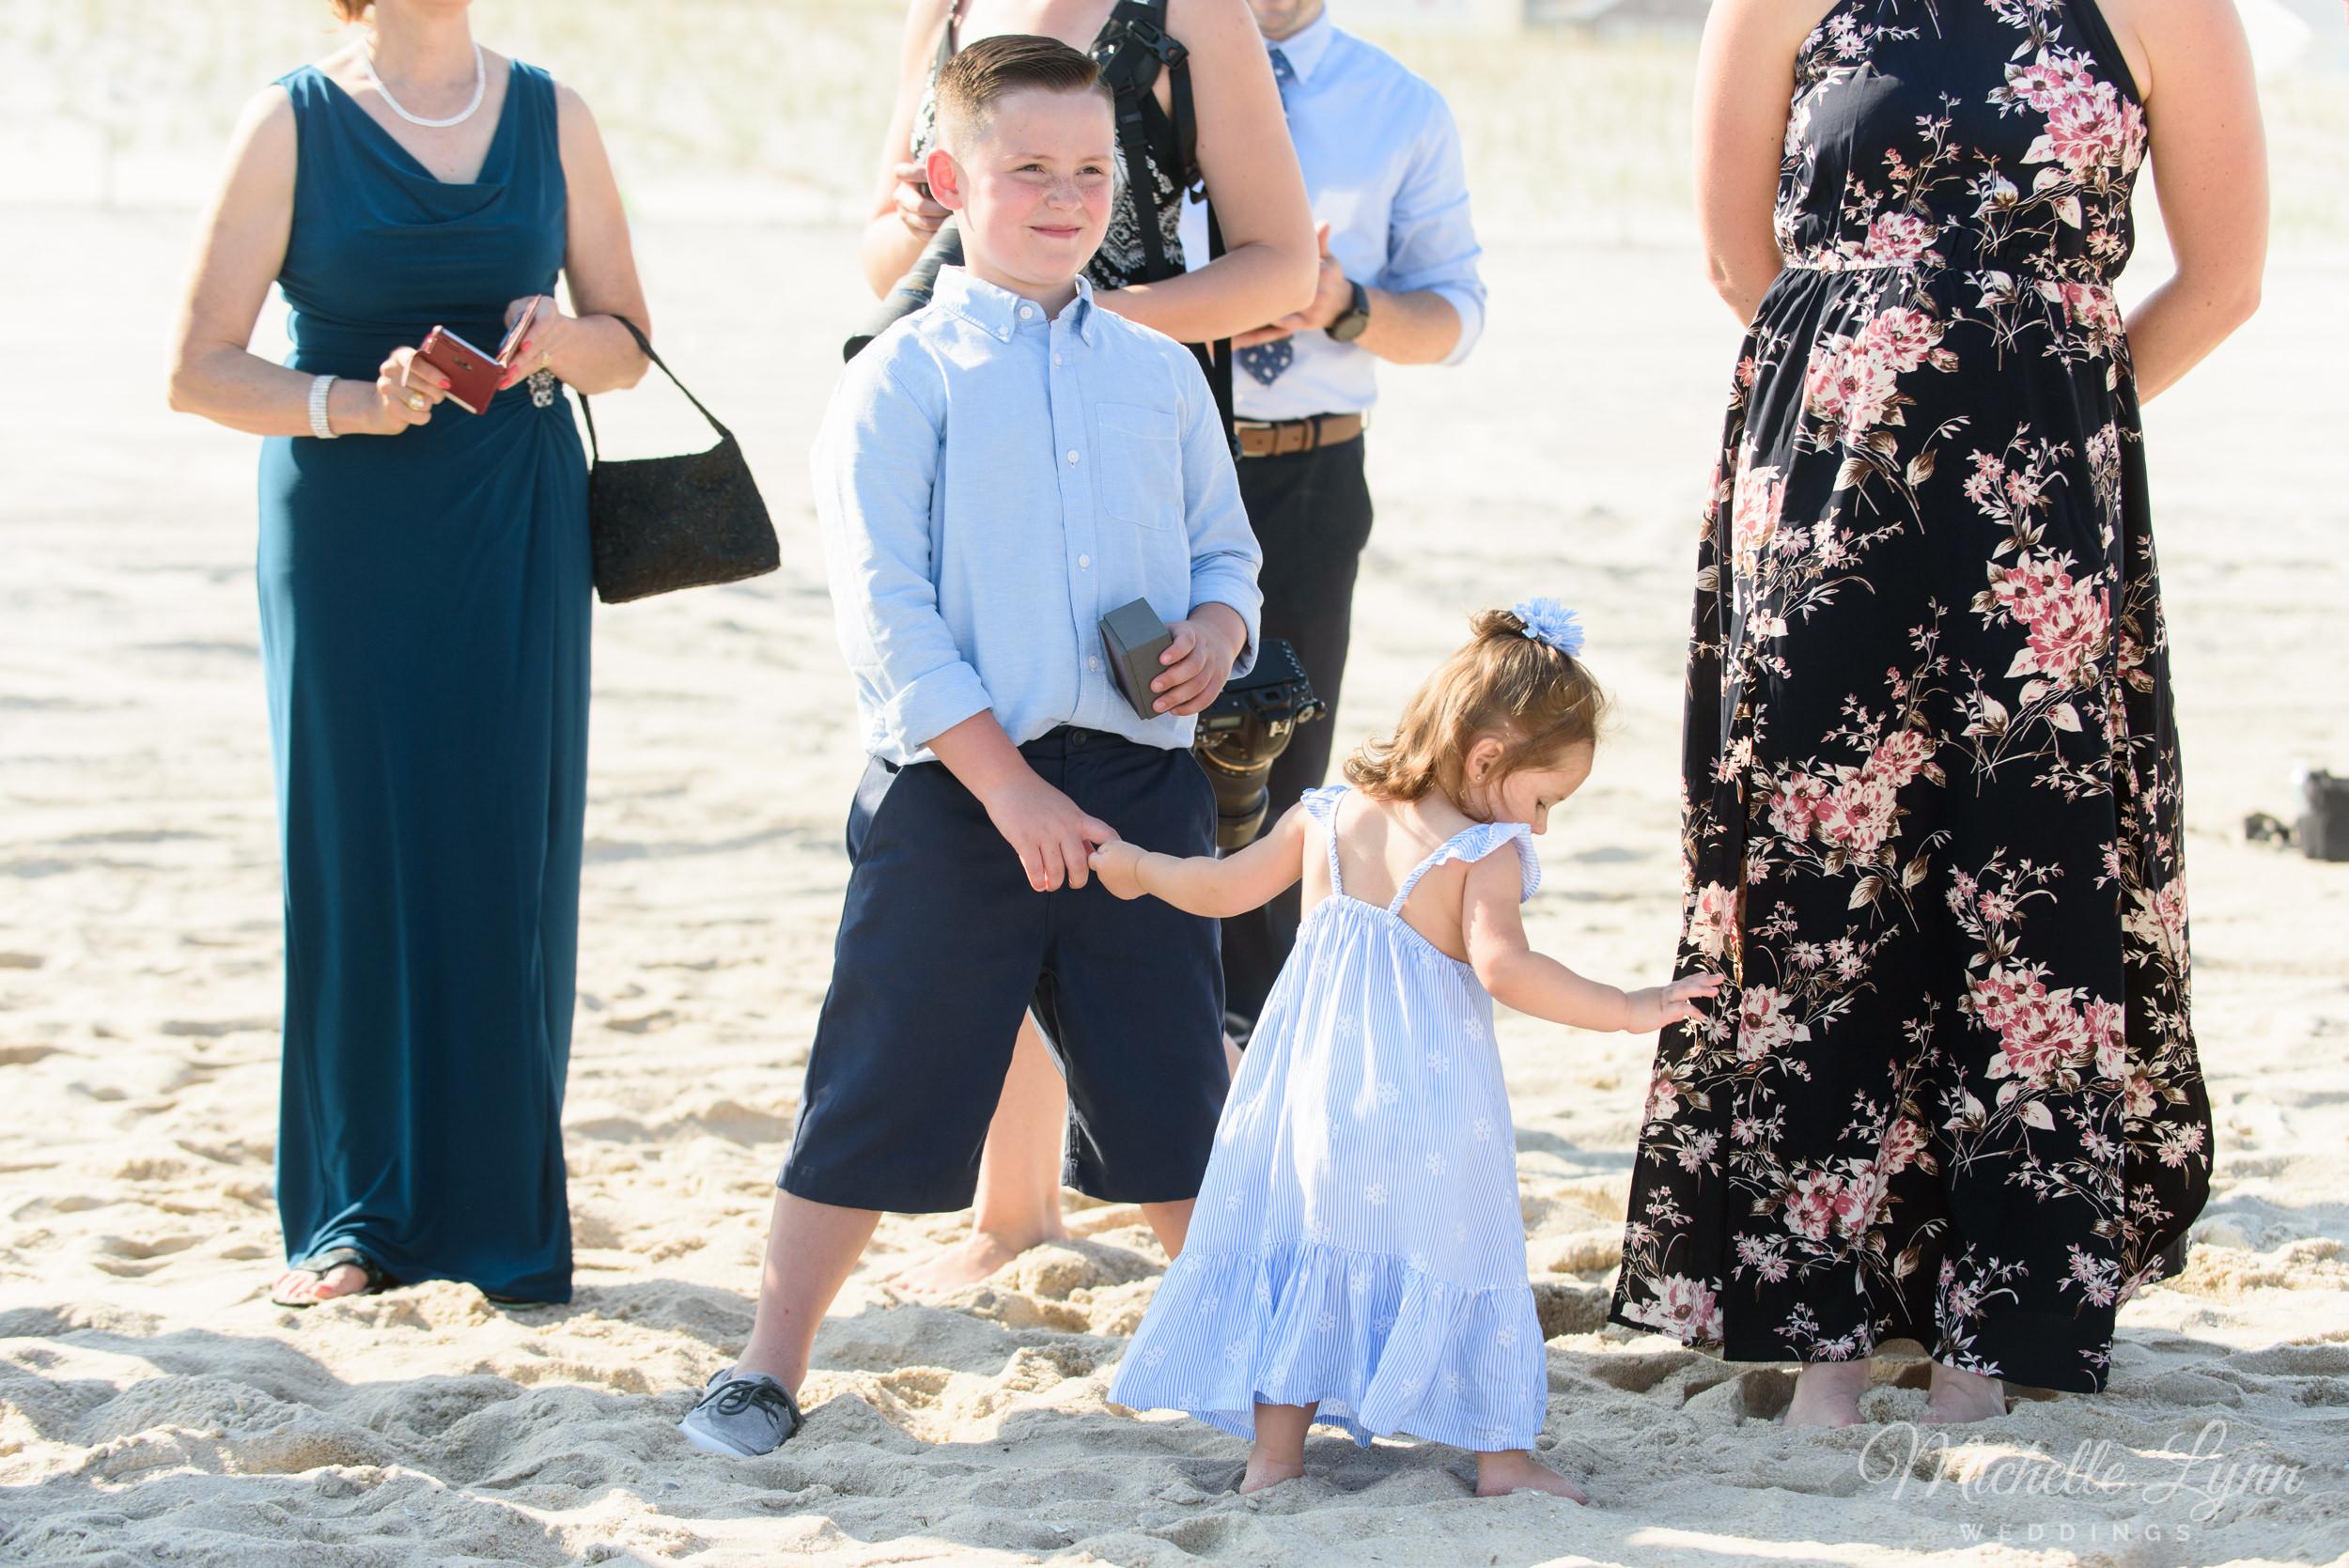 mlw-brant-beach-lbi-wedding-photography-20.jpg